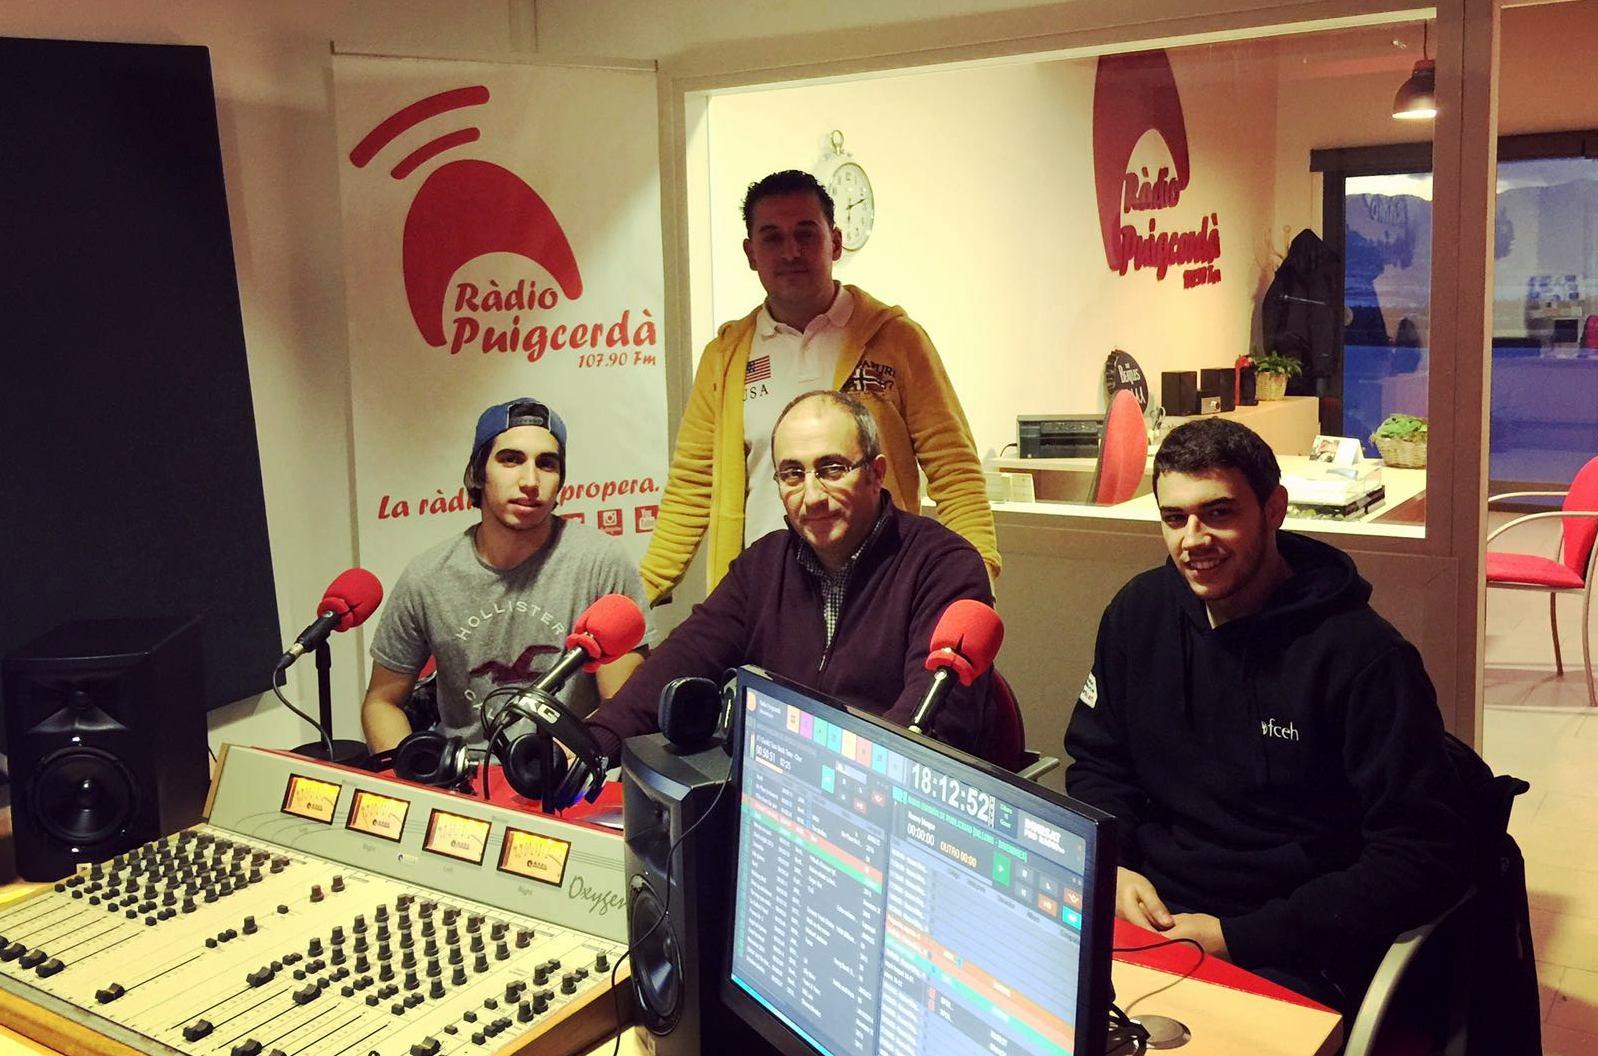 foto-entrevista-granell-paul-radio-puigcerda-16-01-17-edit